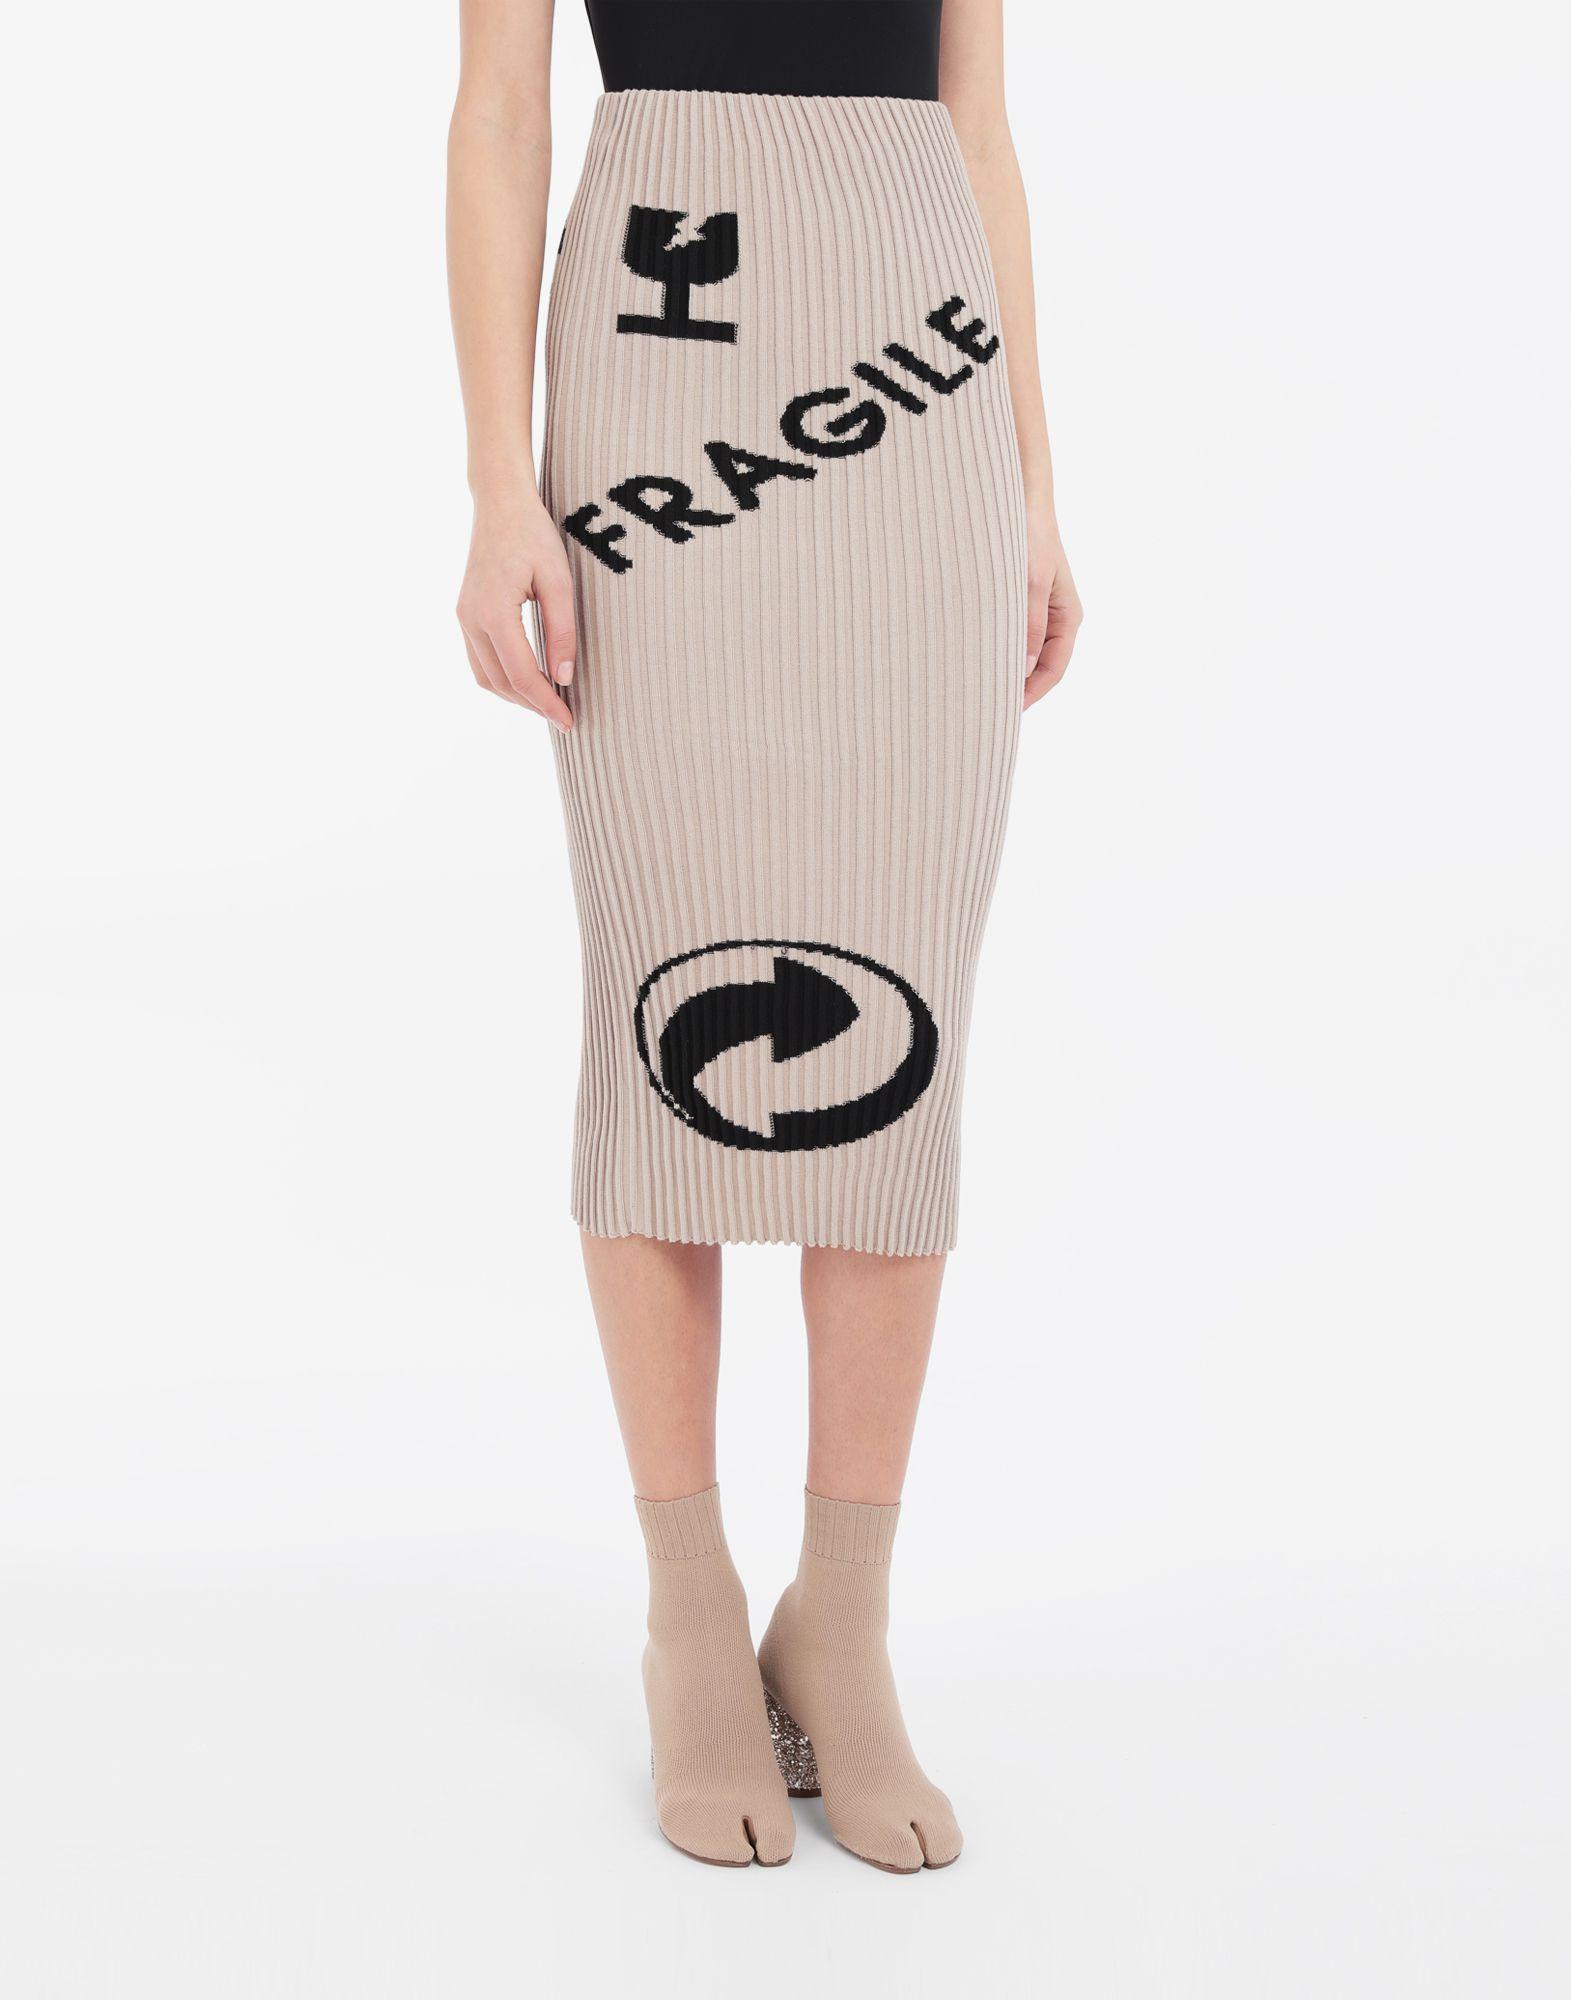 MAISON MARGIELA Knit ribs skirt in 'Carton' intarsia 3/4 length skirt Woman r